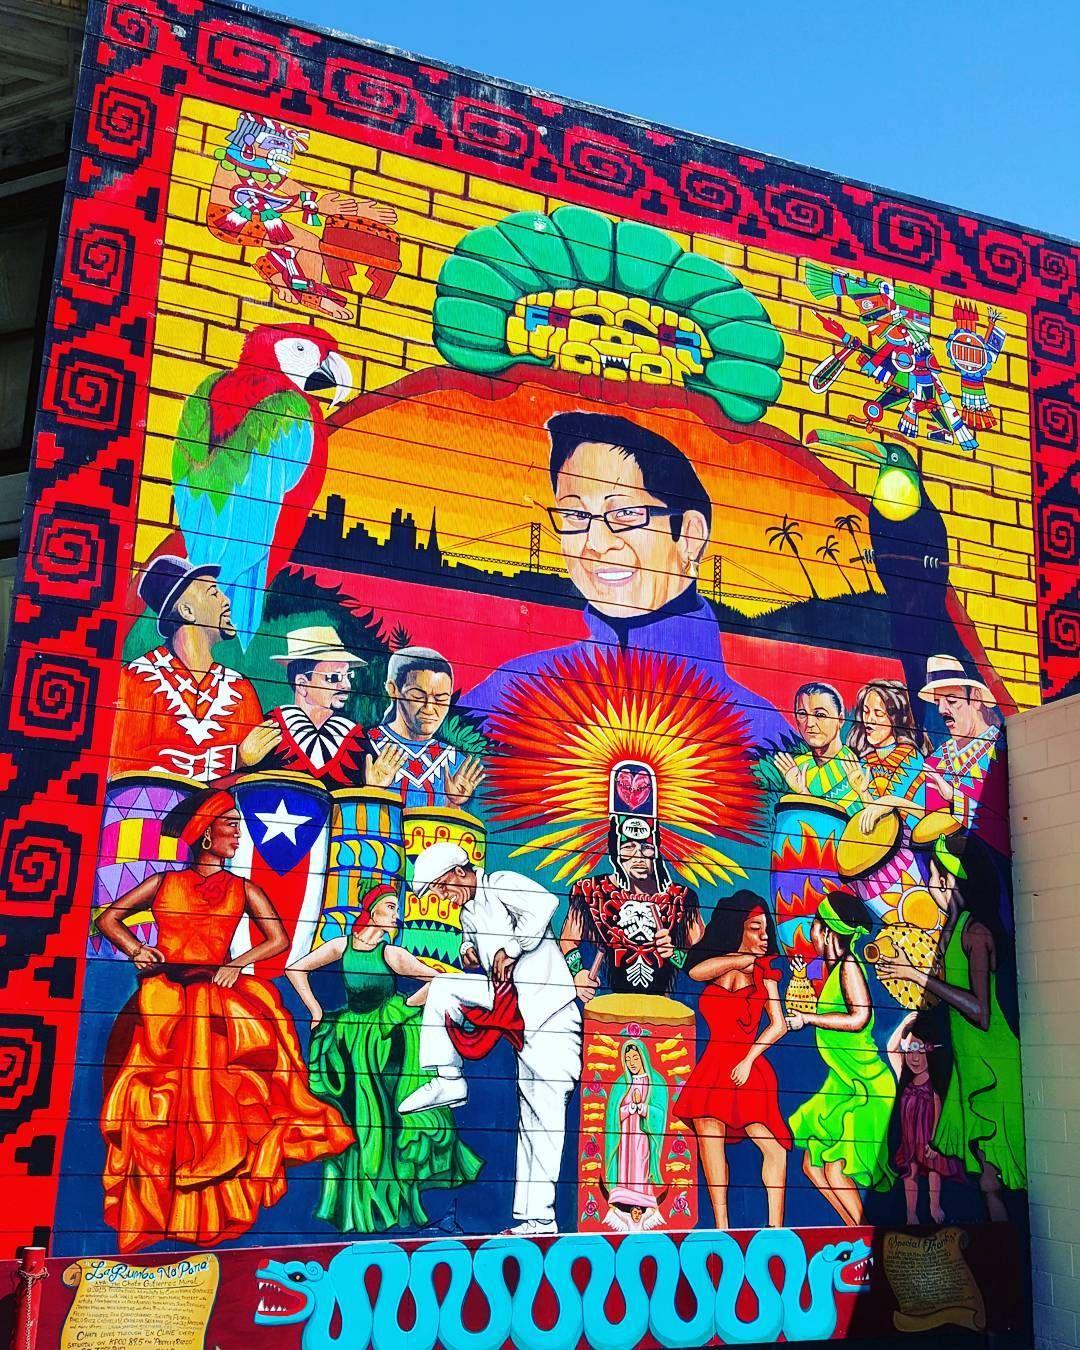 #streetart #mission #24thstreet #sanfrancisco #californialove #francaisauxusa #cali   Photo de @xavitwitr